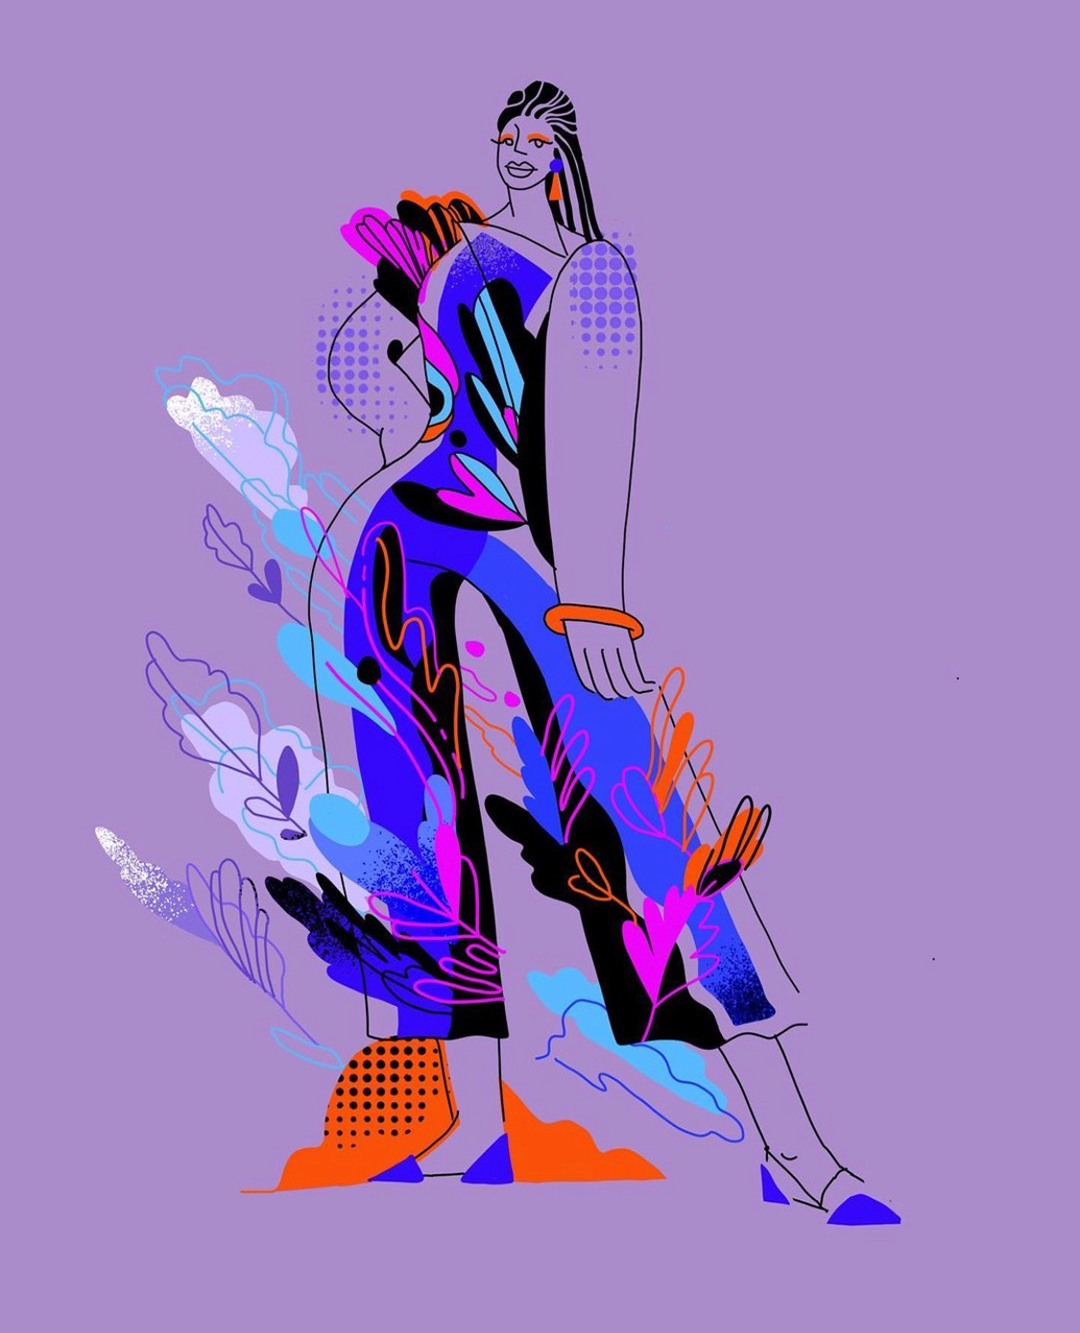 GirlsclubAsia-Illustration-Animation-Lilian Darmono-Fashionista